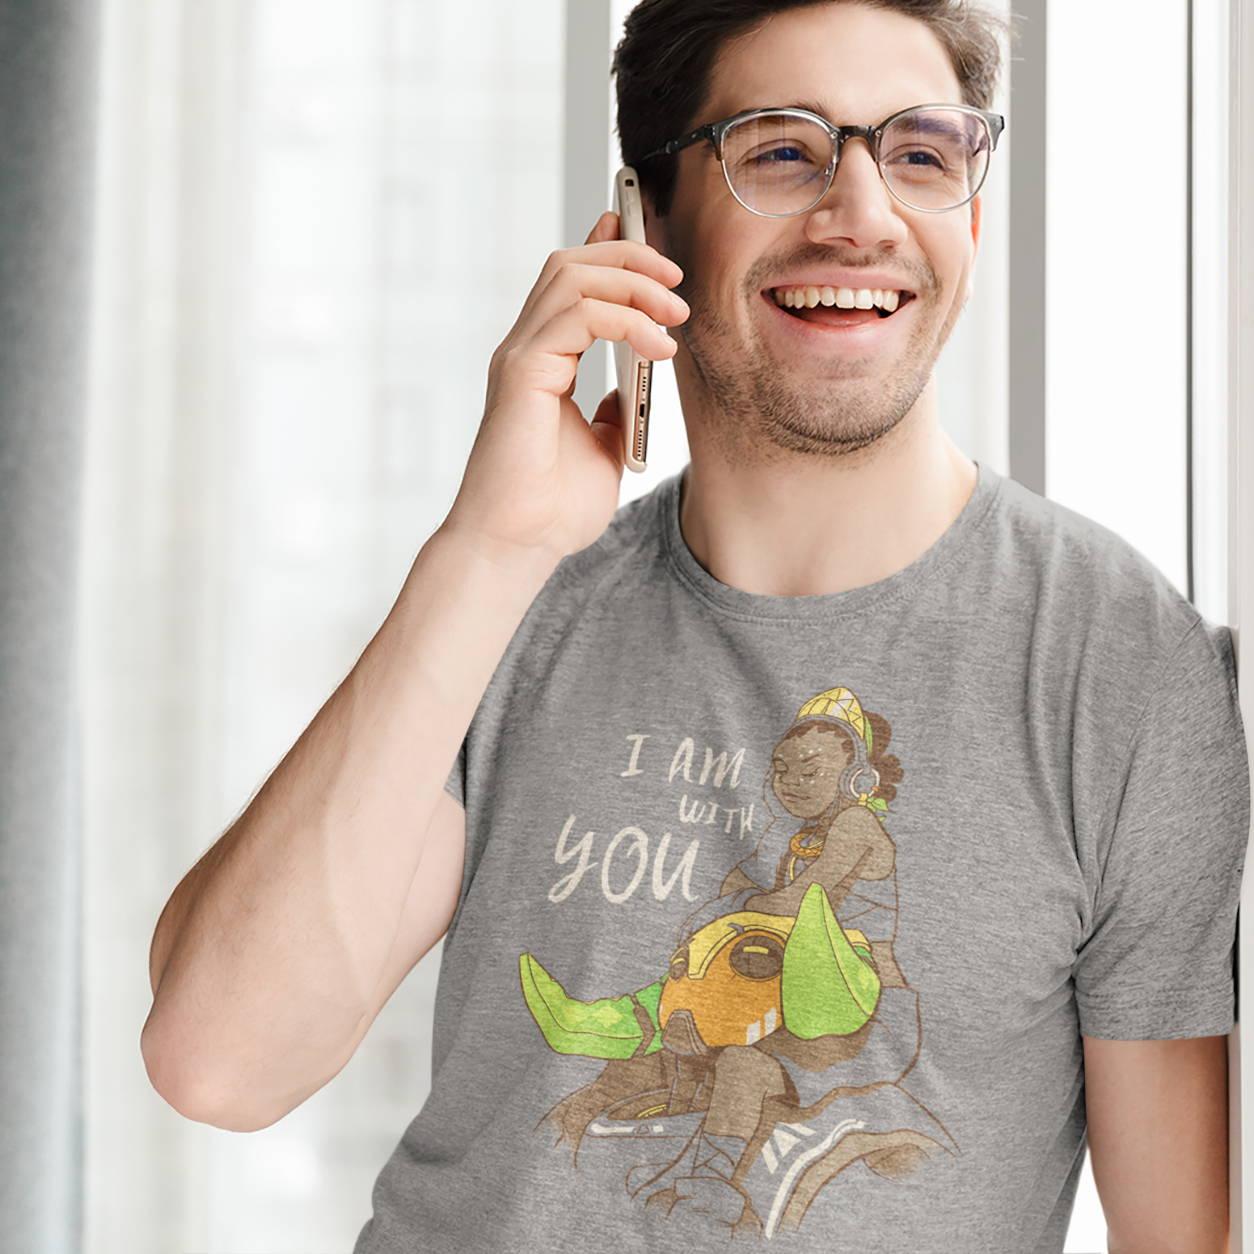 Male model wearing an Overwatch shirt